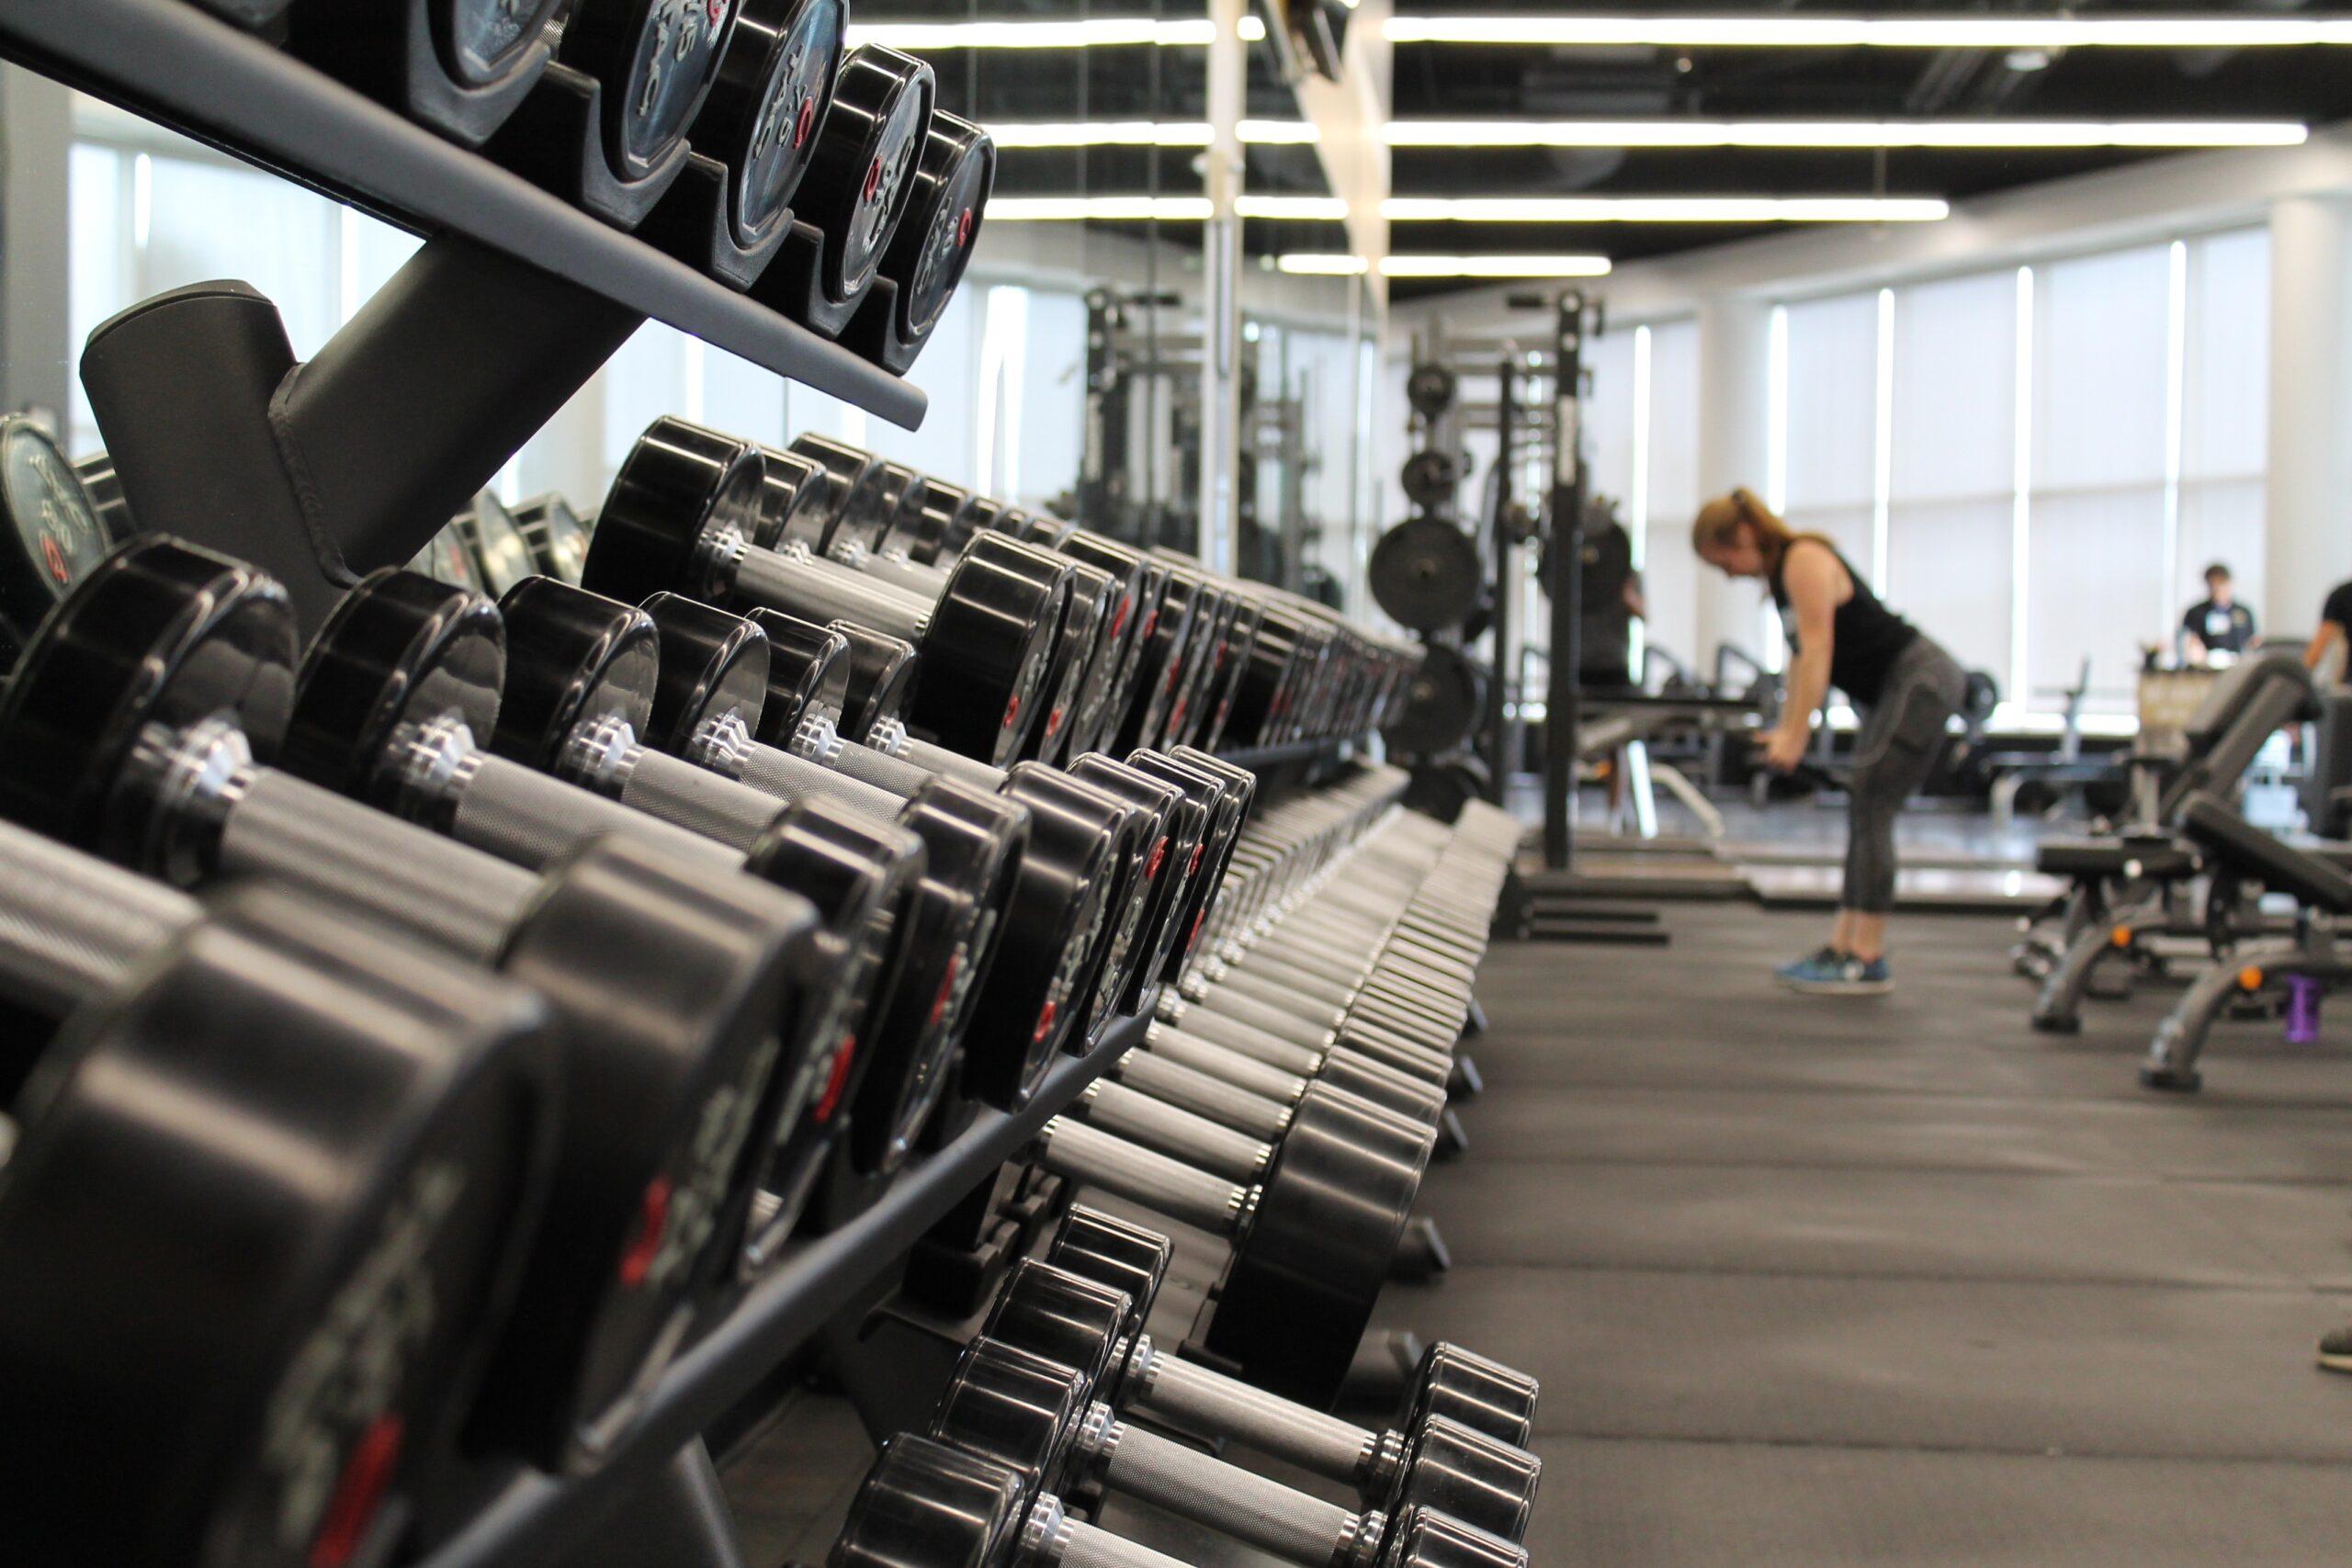 No enrolment weightlifting equipment